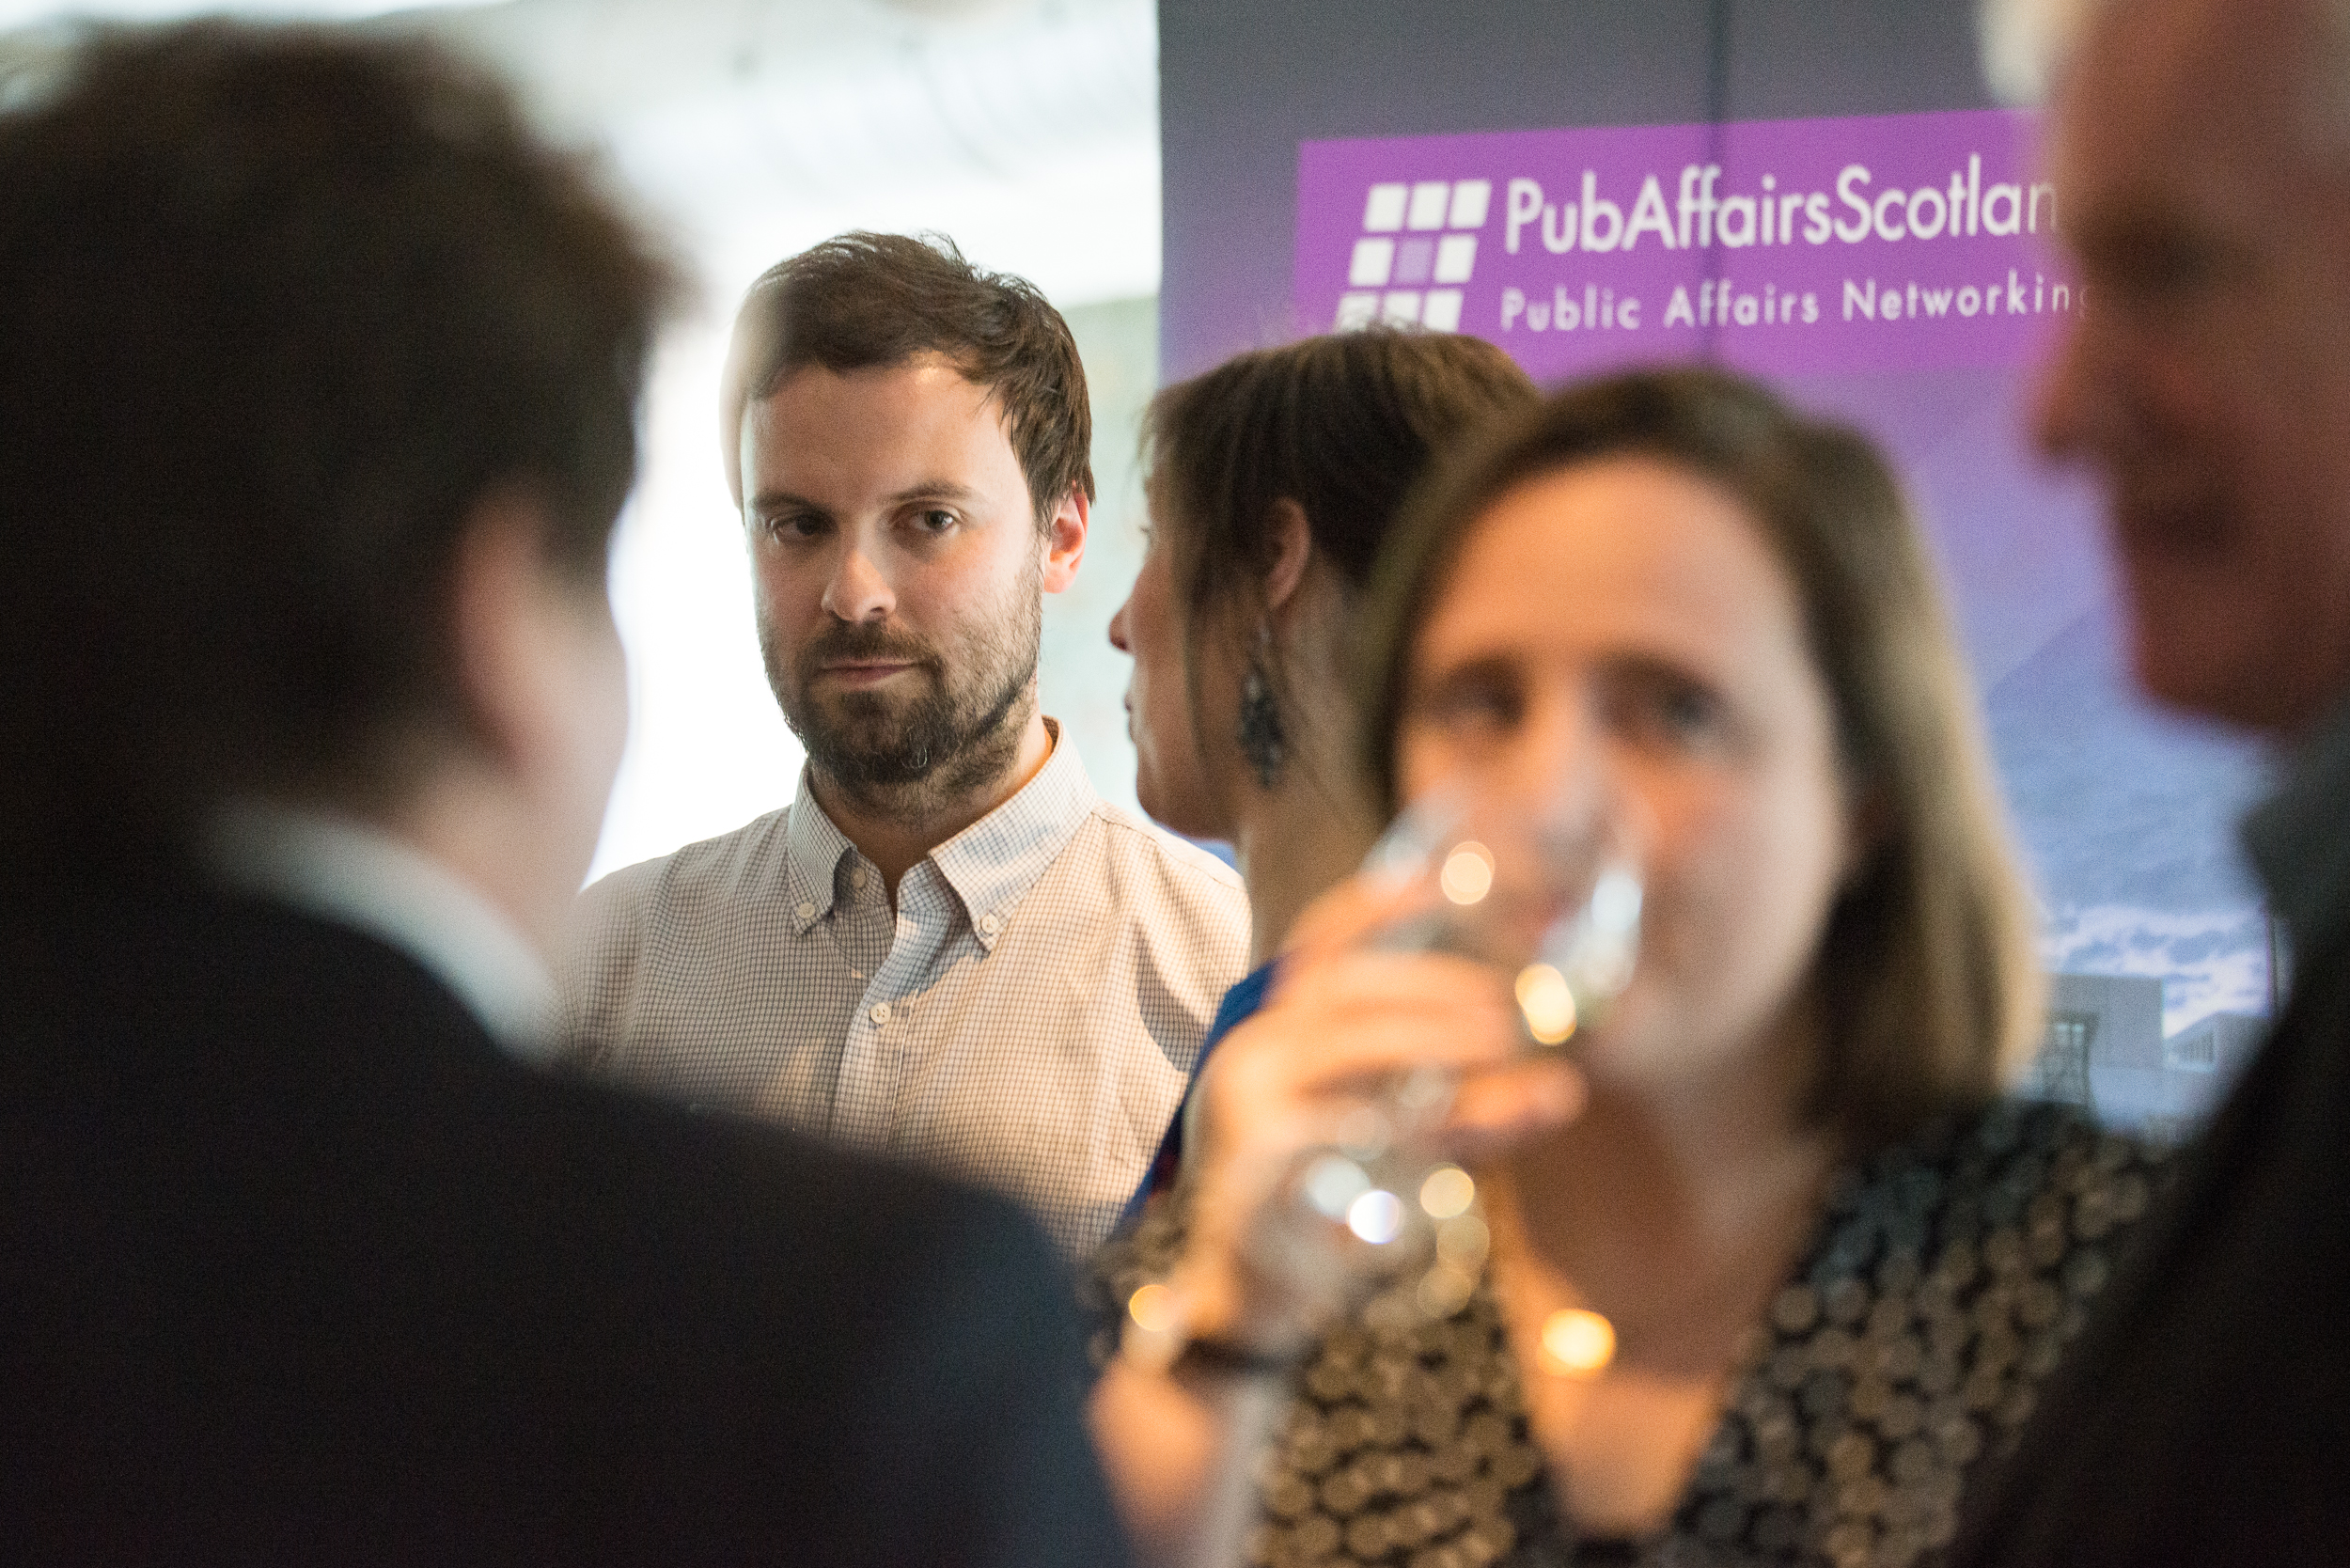 PubAffairs Scotland Networking Event, June 2018